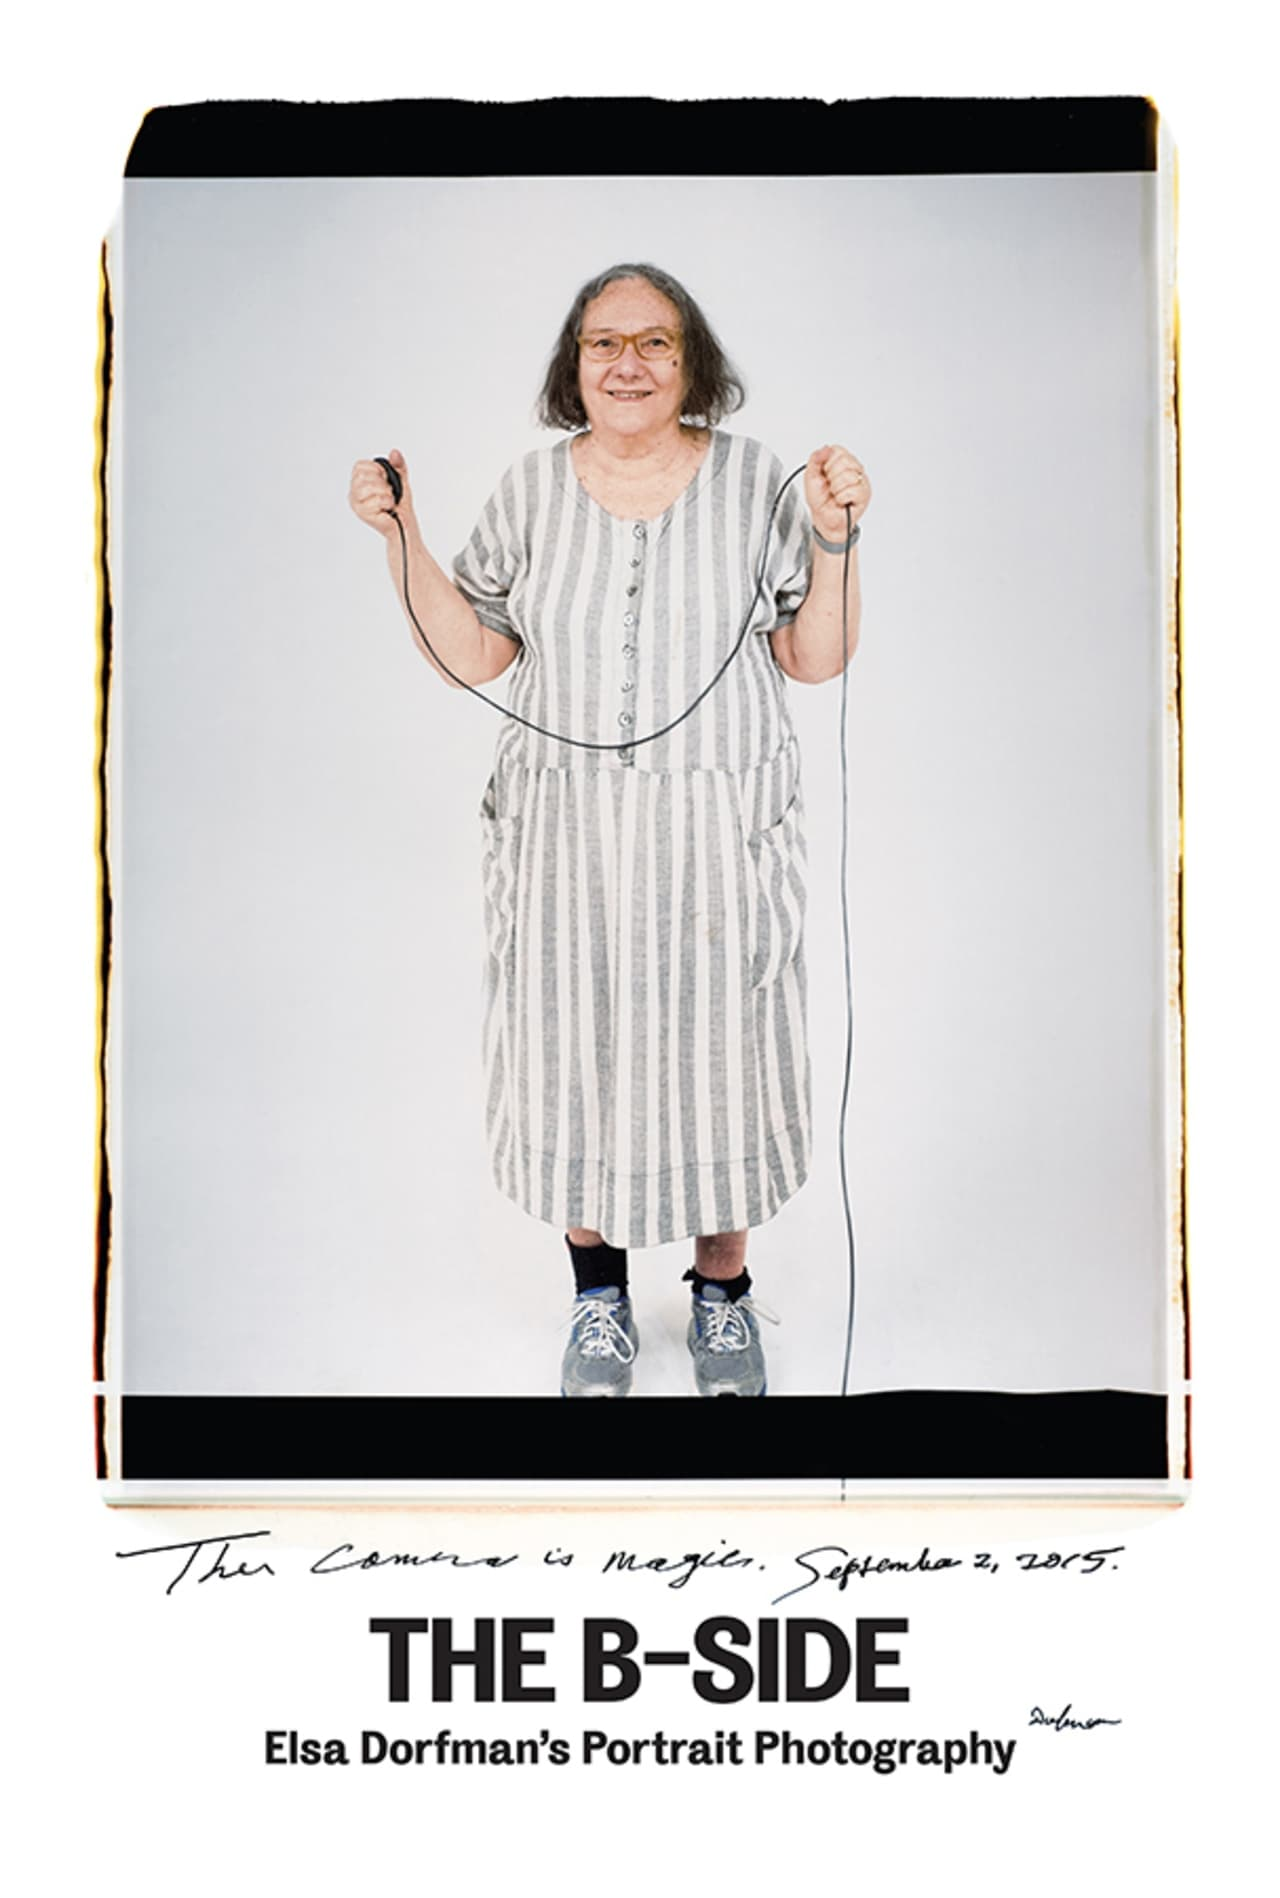 The B-Side: Elsa Dorfman's Portrait Photography (2017)